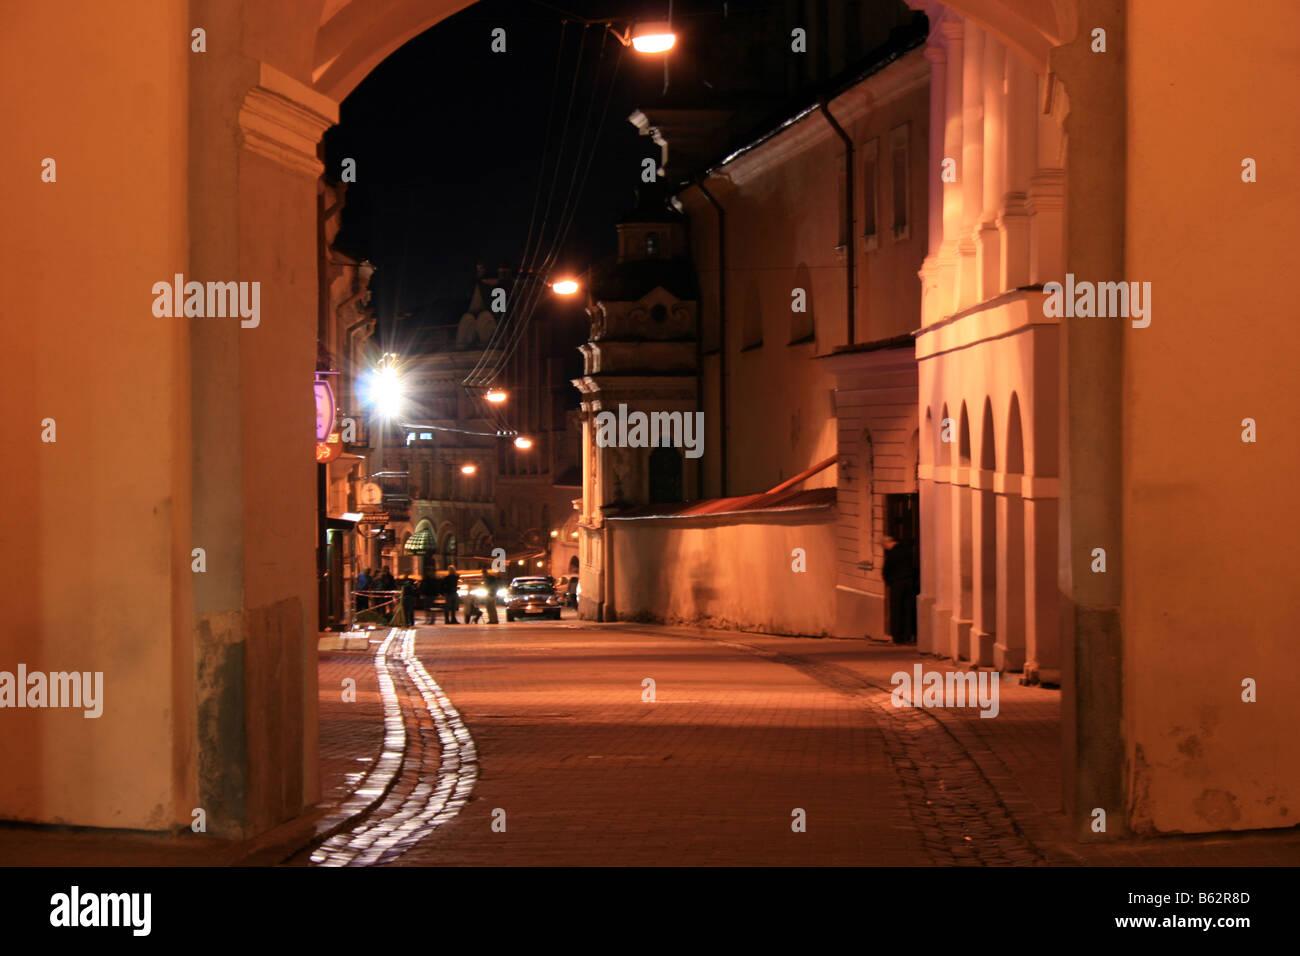 Dawn Gate, night view to Ausros vartu street, Vilnius, Lithuania - Stock Image